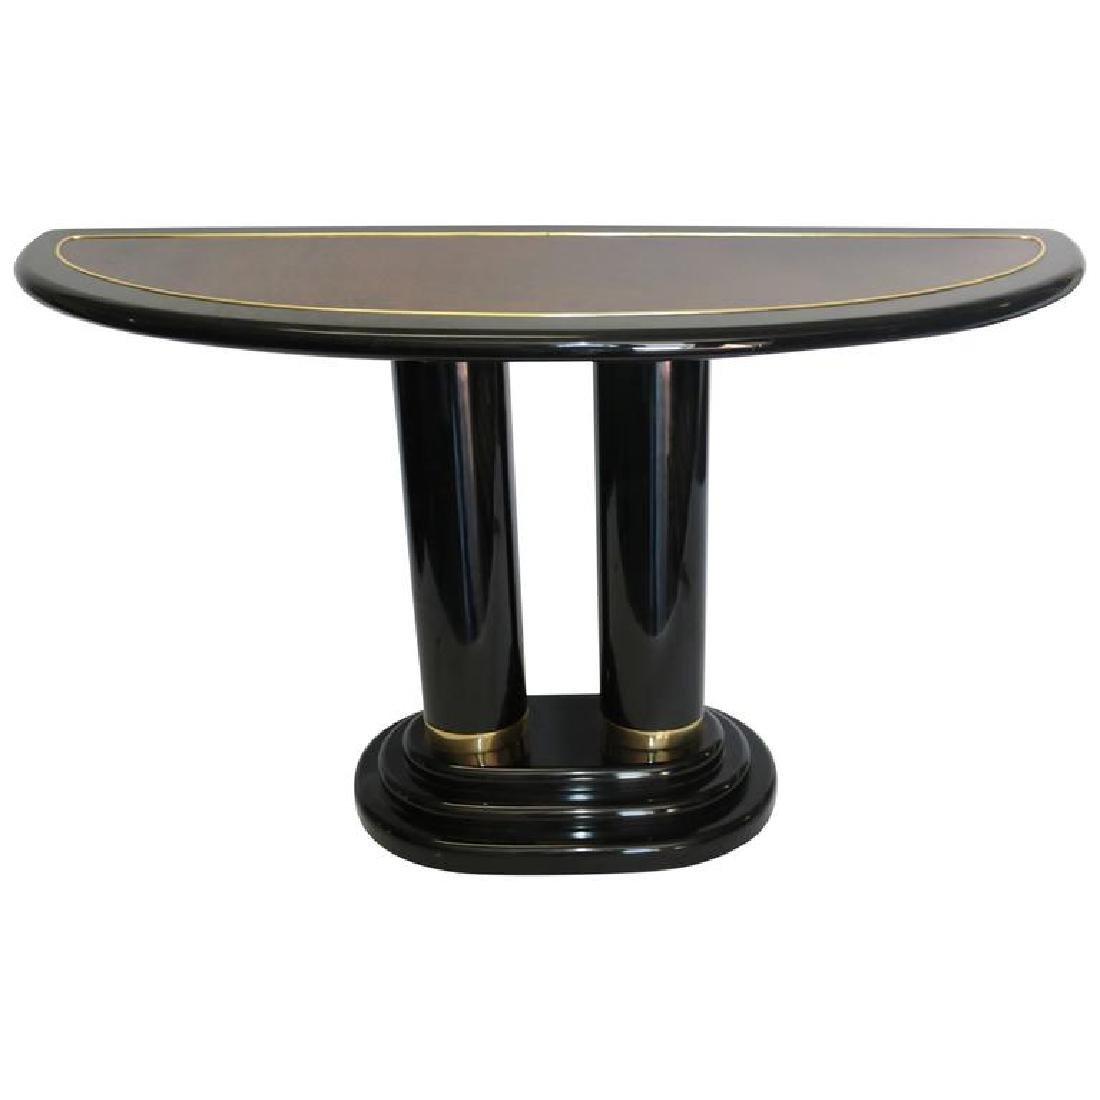 Henredon Pedestal Modern Black Lacquer Console Table